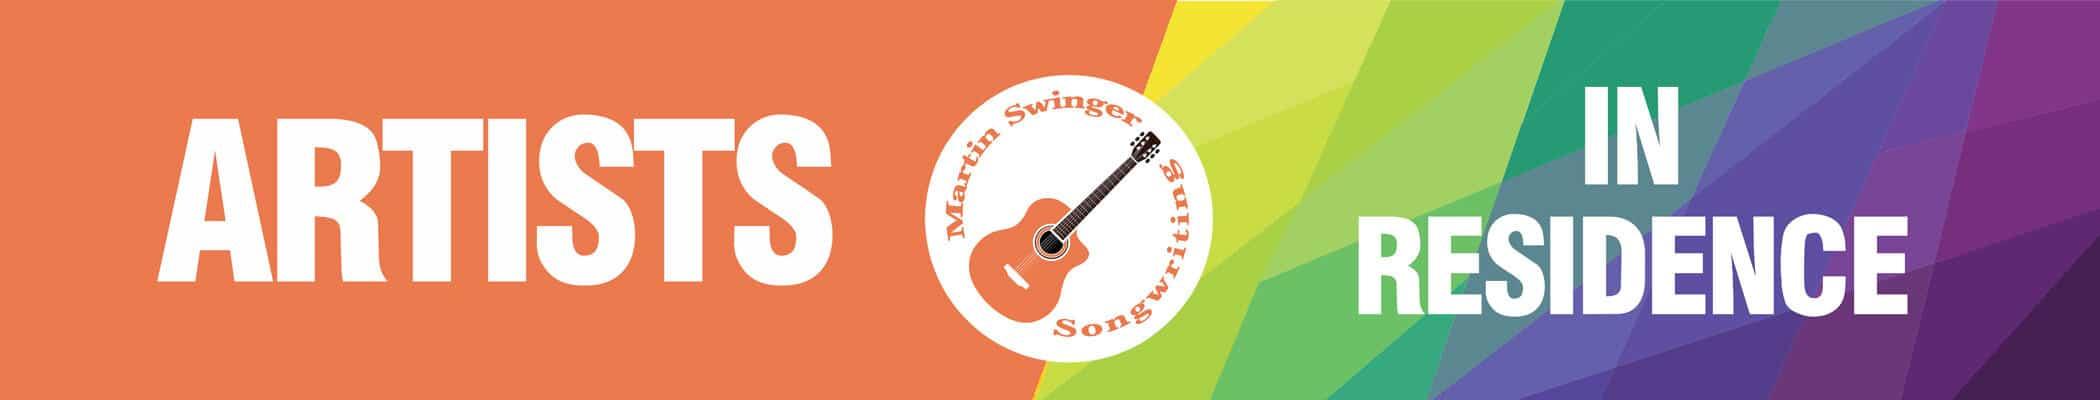 martin swinger songwriting artists in residence, school